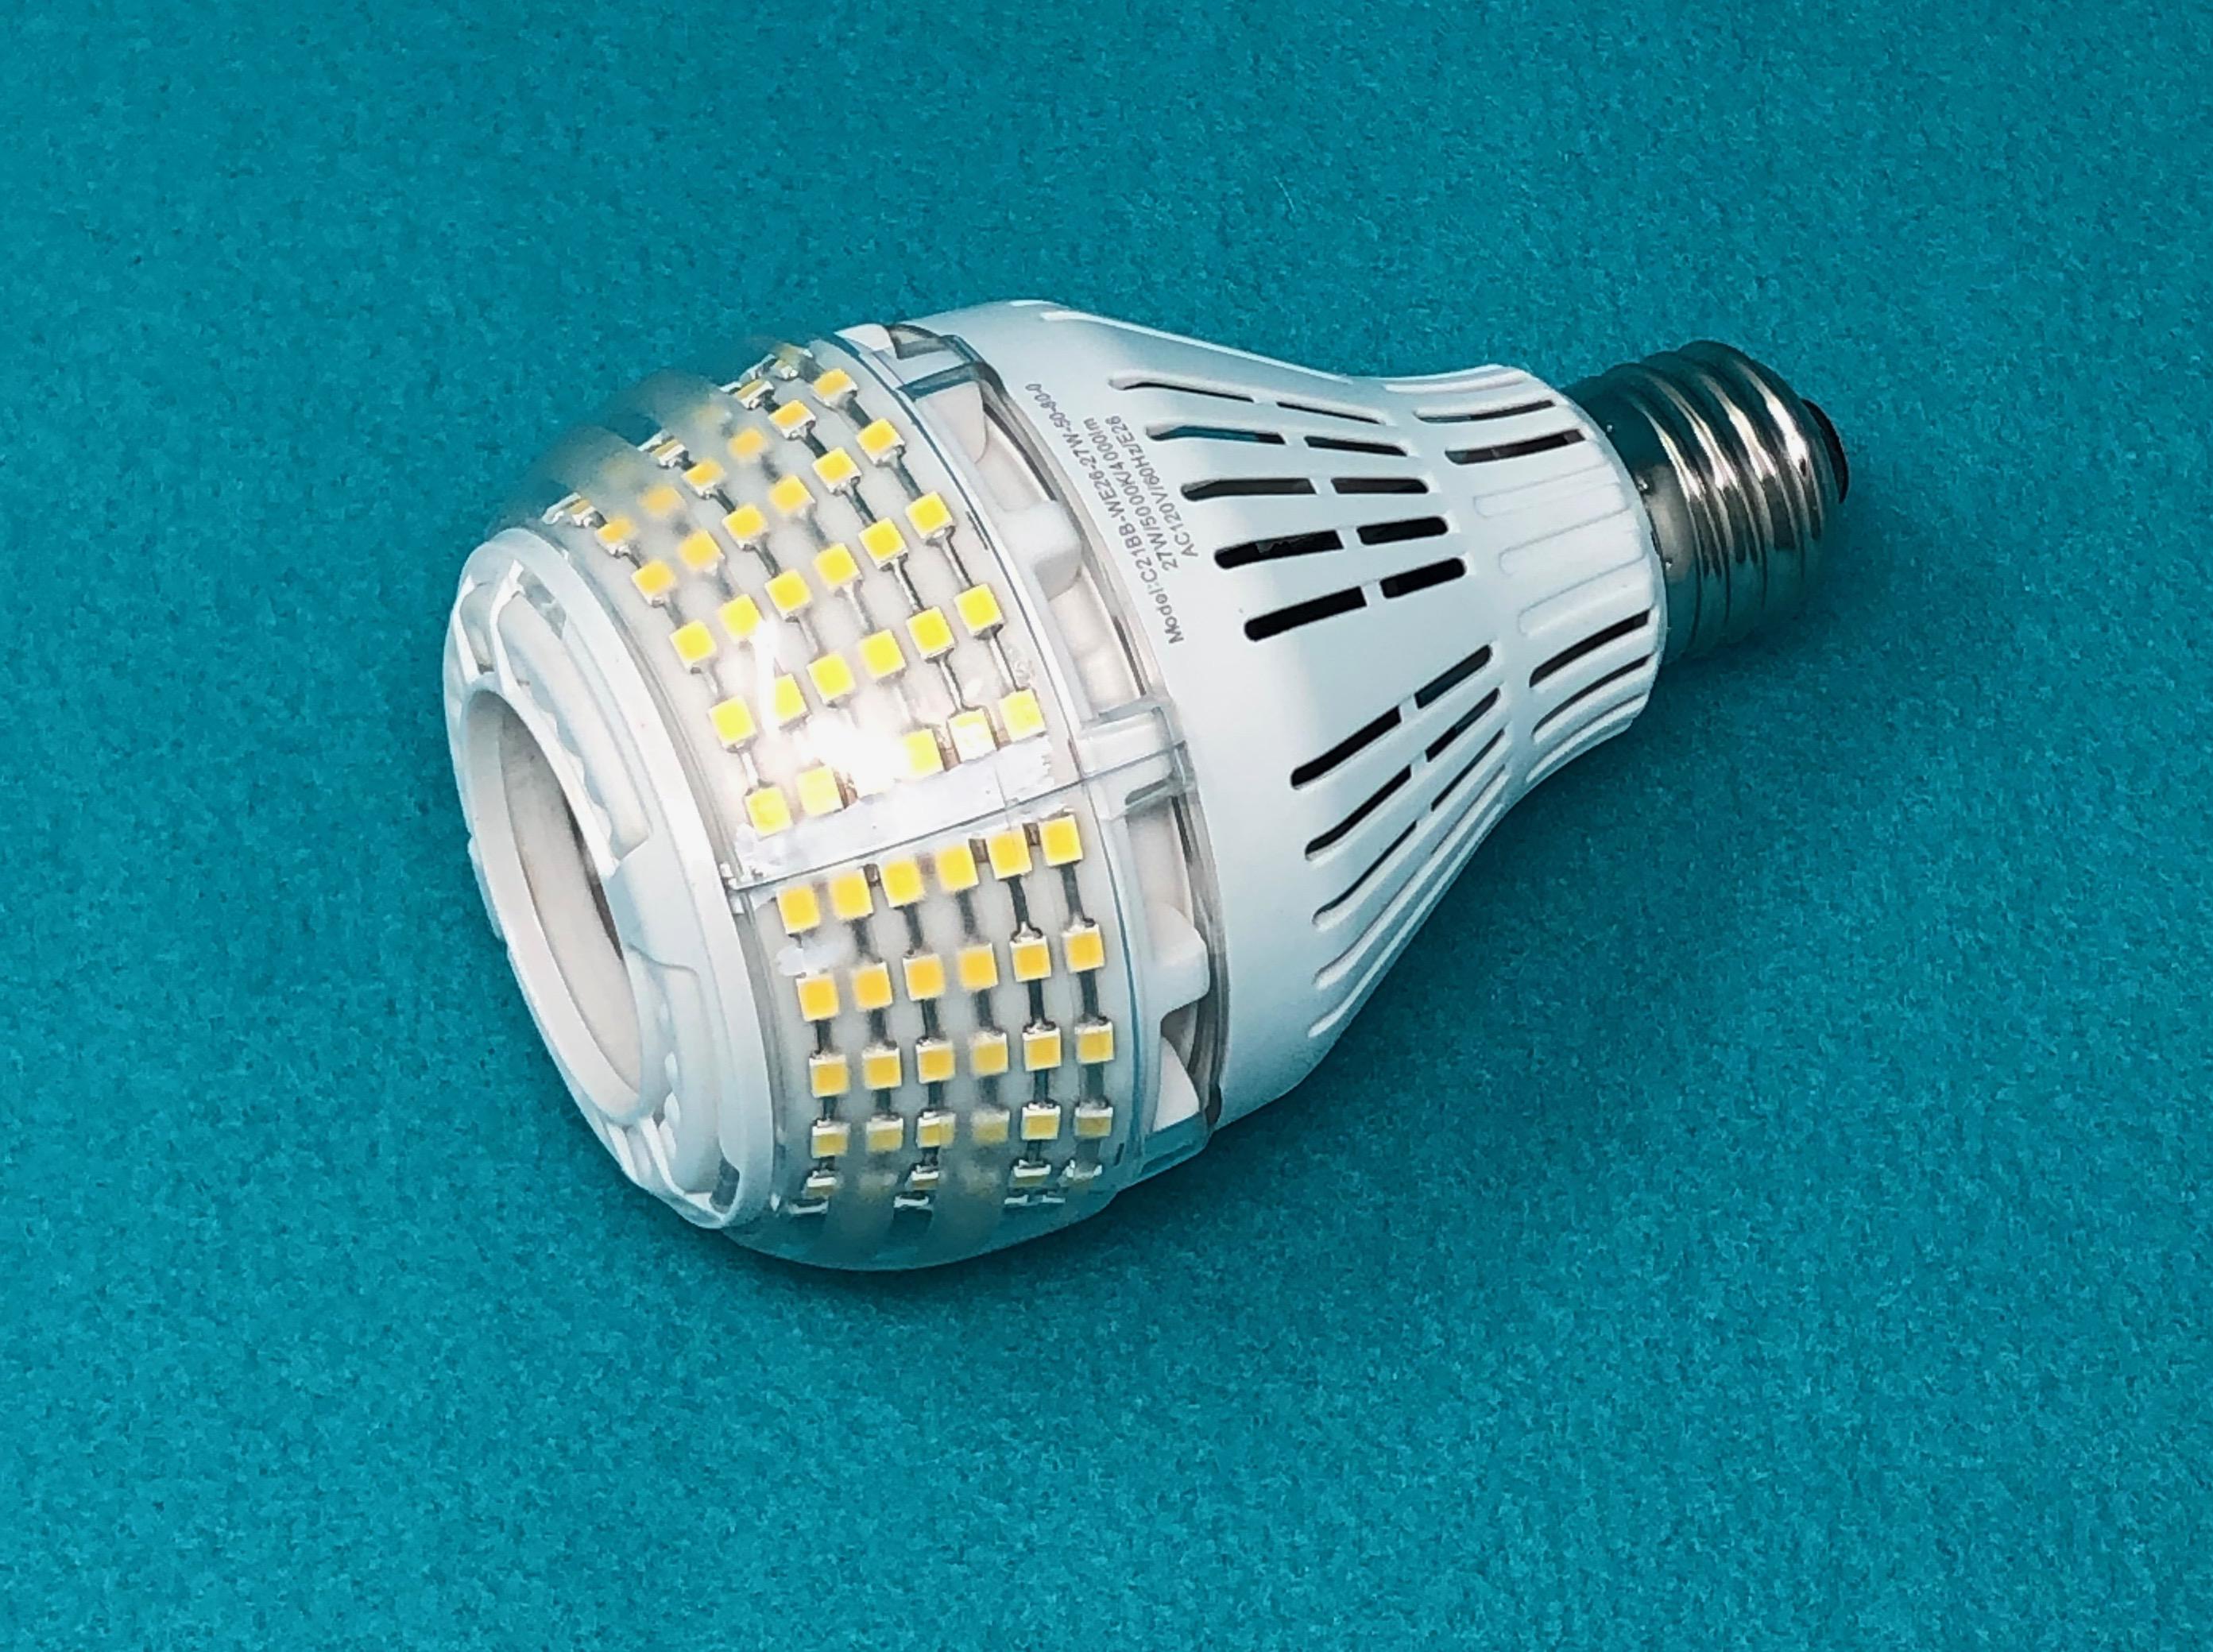 SANSI A21 omni-directional LED light bulb review – The Gadgeteer